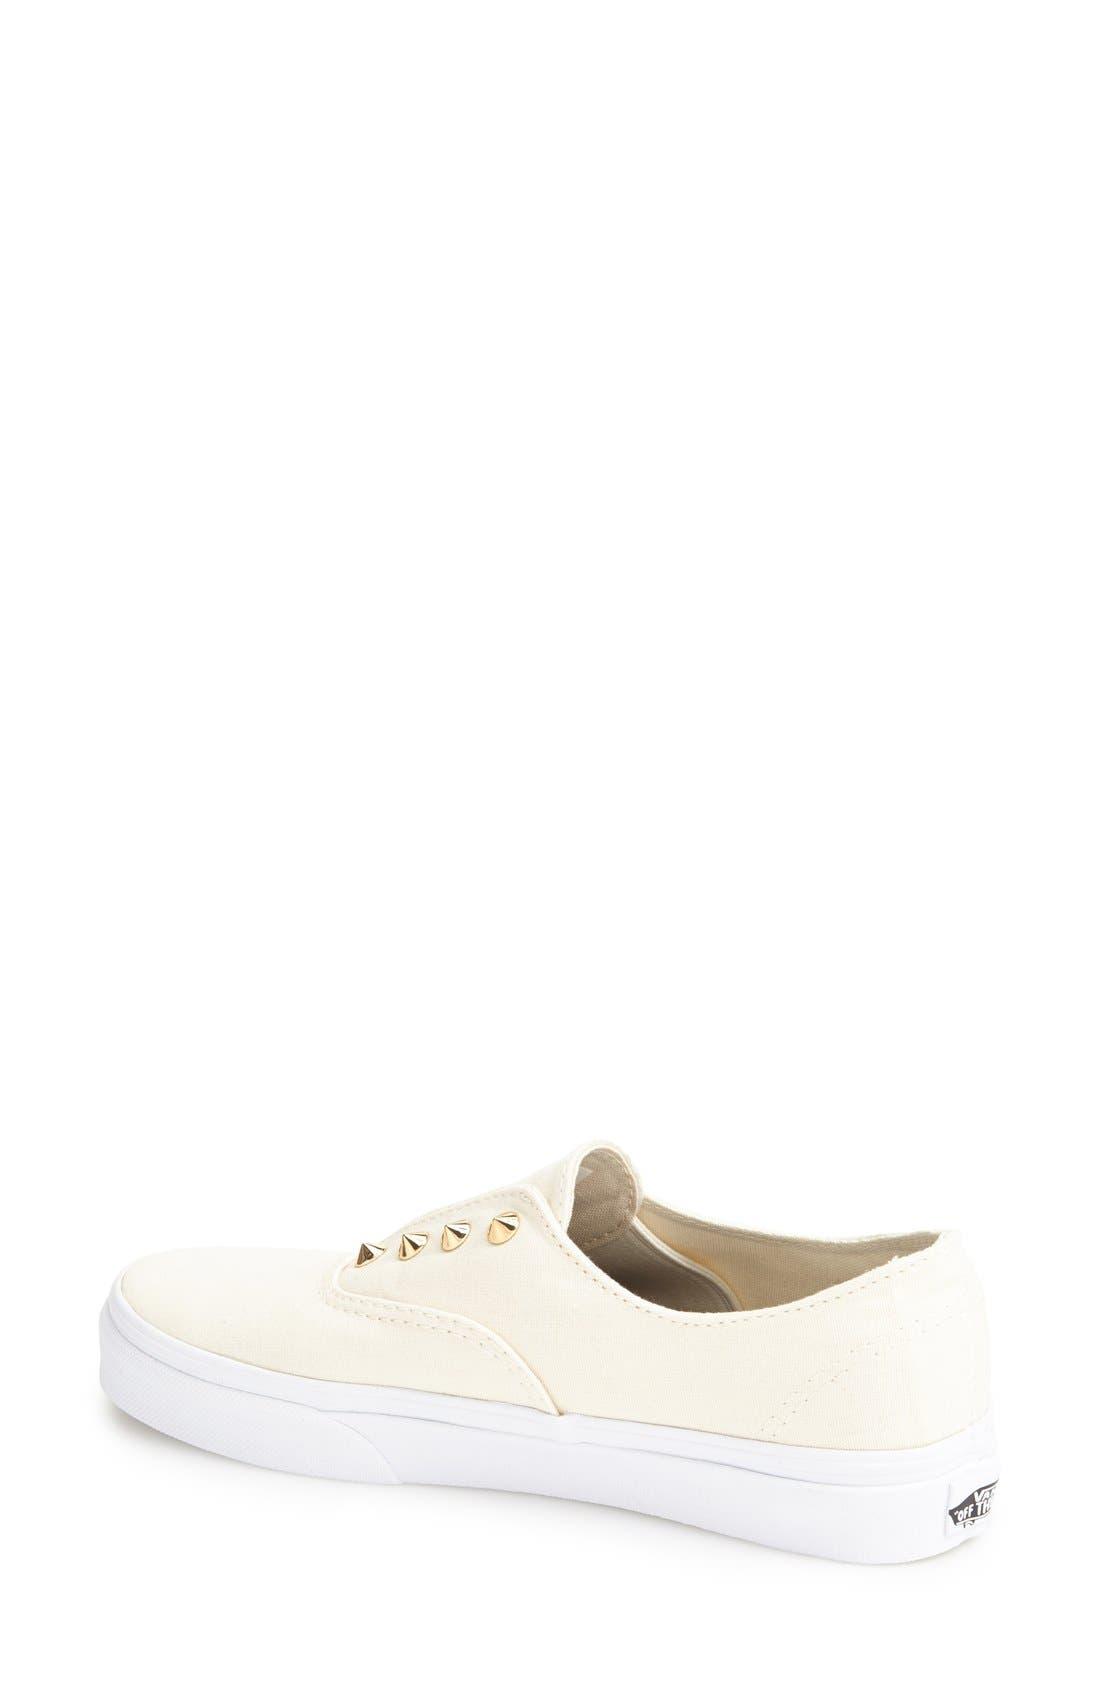 Alternate Image 2  - Vans 'Authentic Gore - Studs' Slip-On Sneaker (Women)